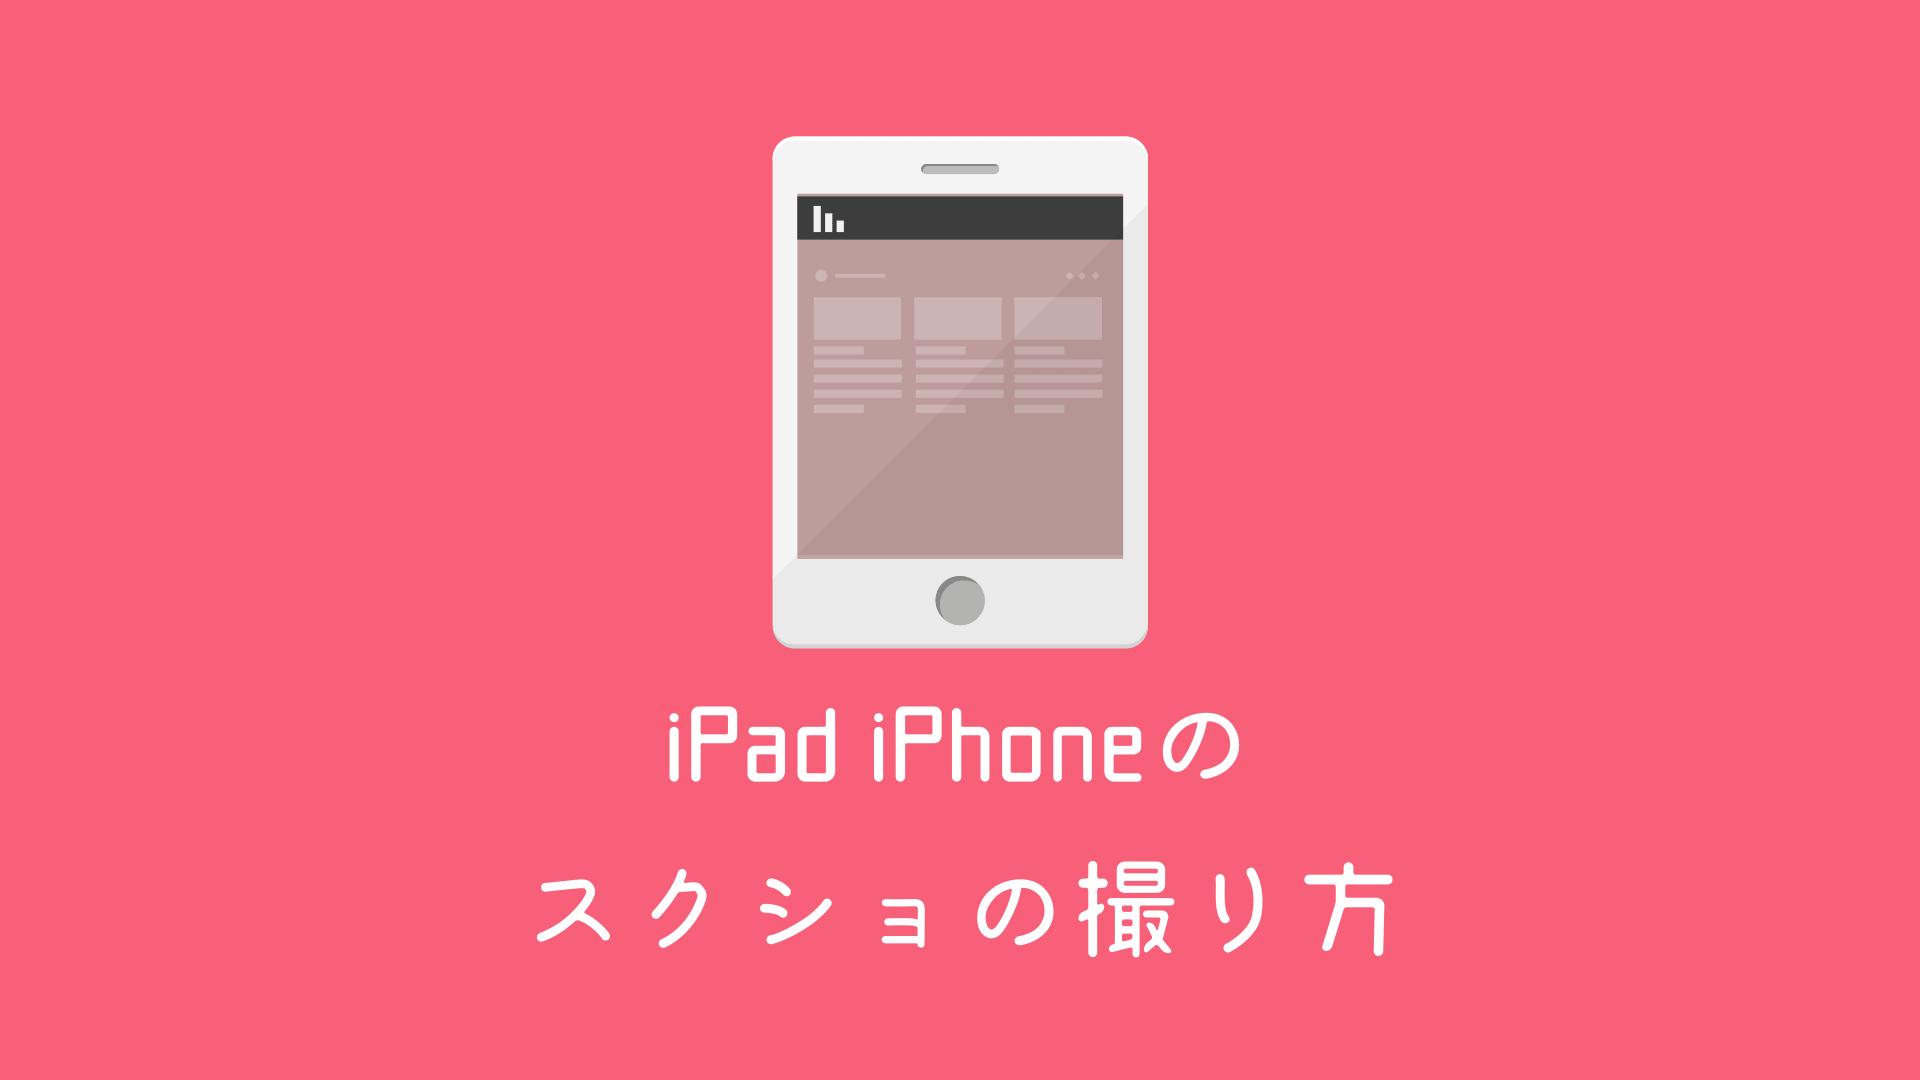 iPad iPhoneのスクショの撮り方のテーマ画像です。